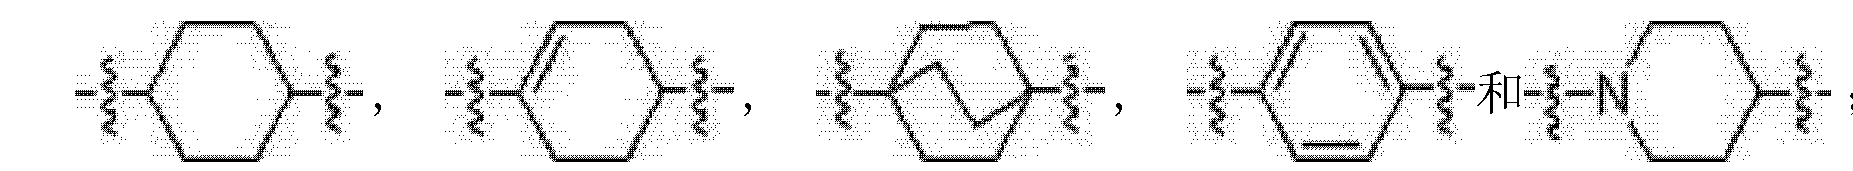 Figure CN102378762AD00201